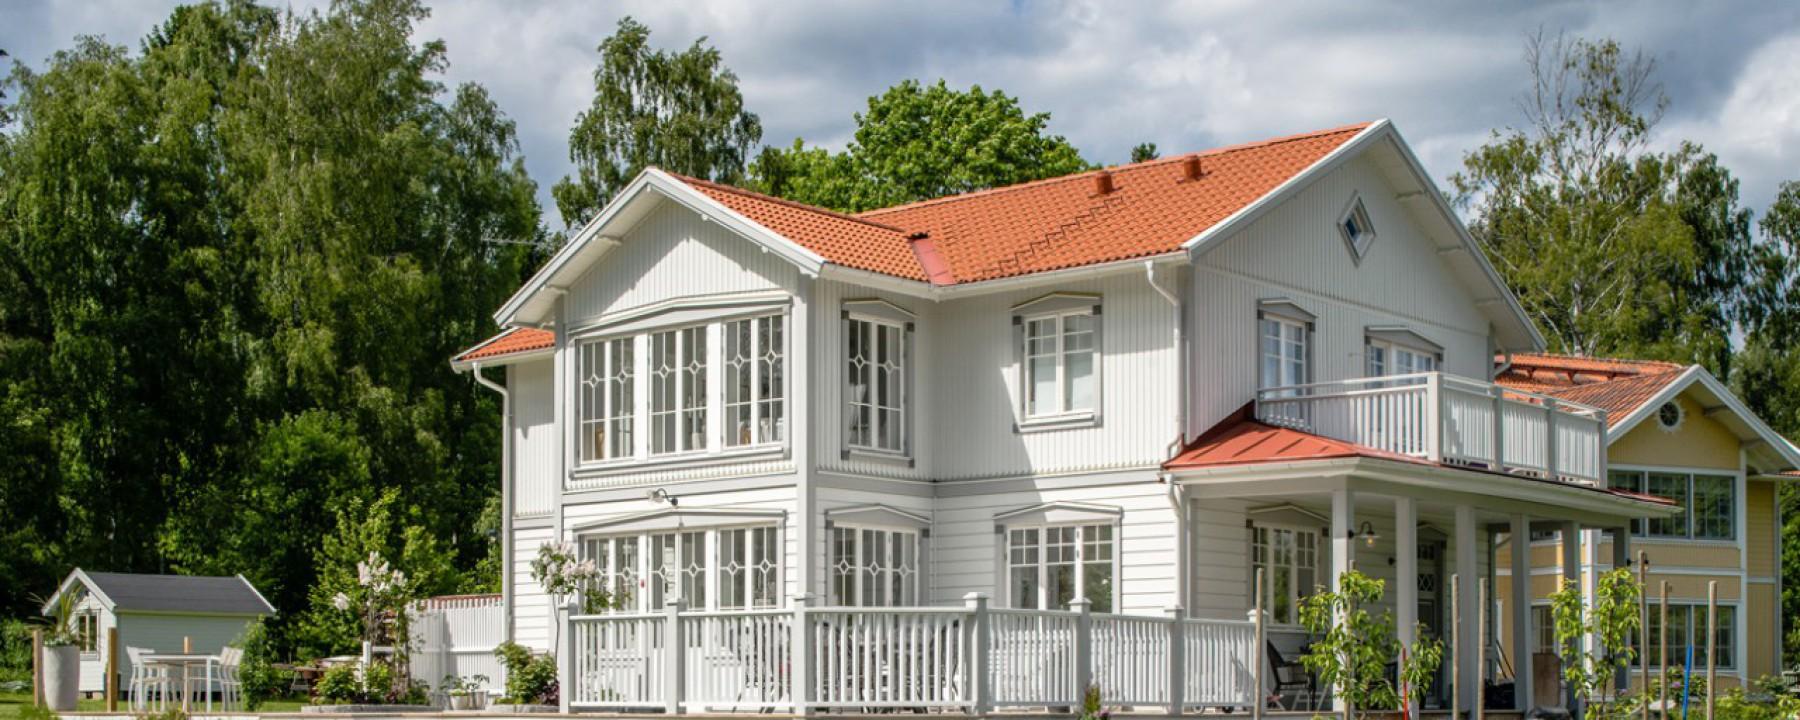 bygga exklusiva hus